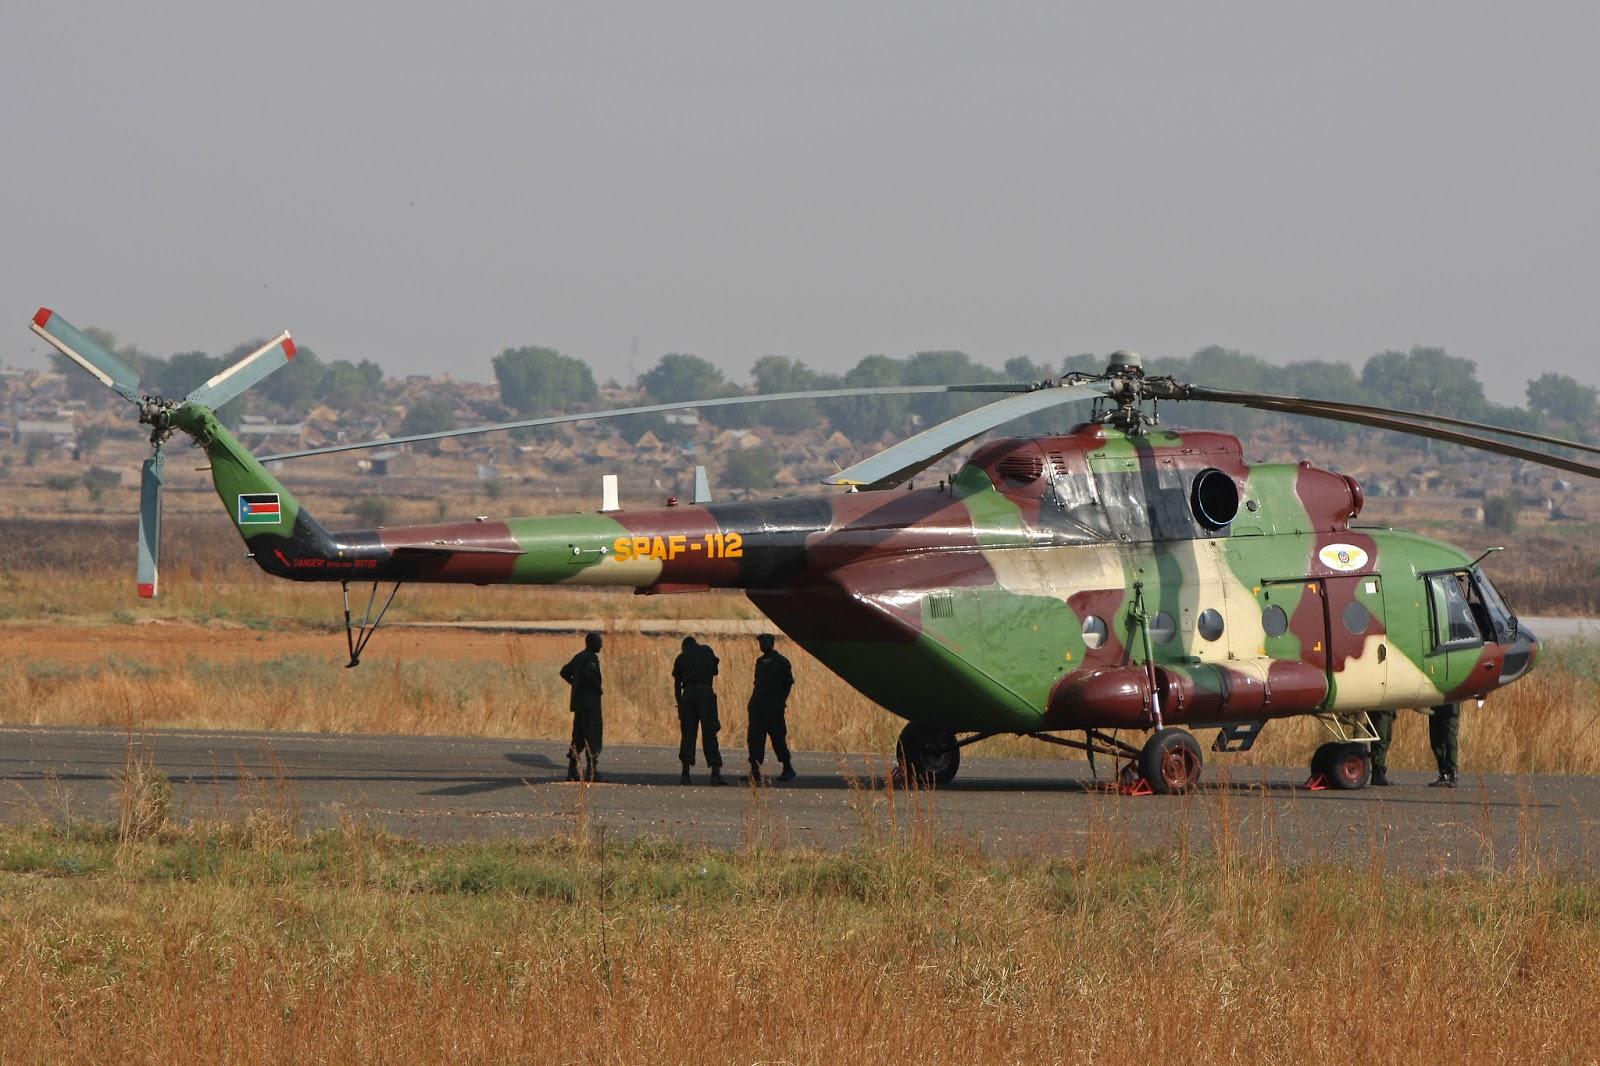 Armées du Sud Soudan MI-17V5+SPAF-112+SUDAN+SUR+RALPH+BLOK